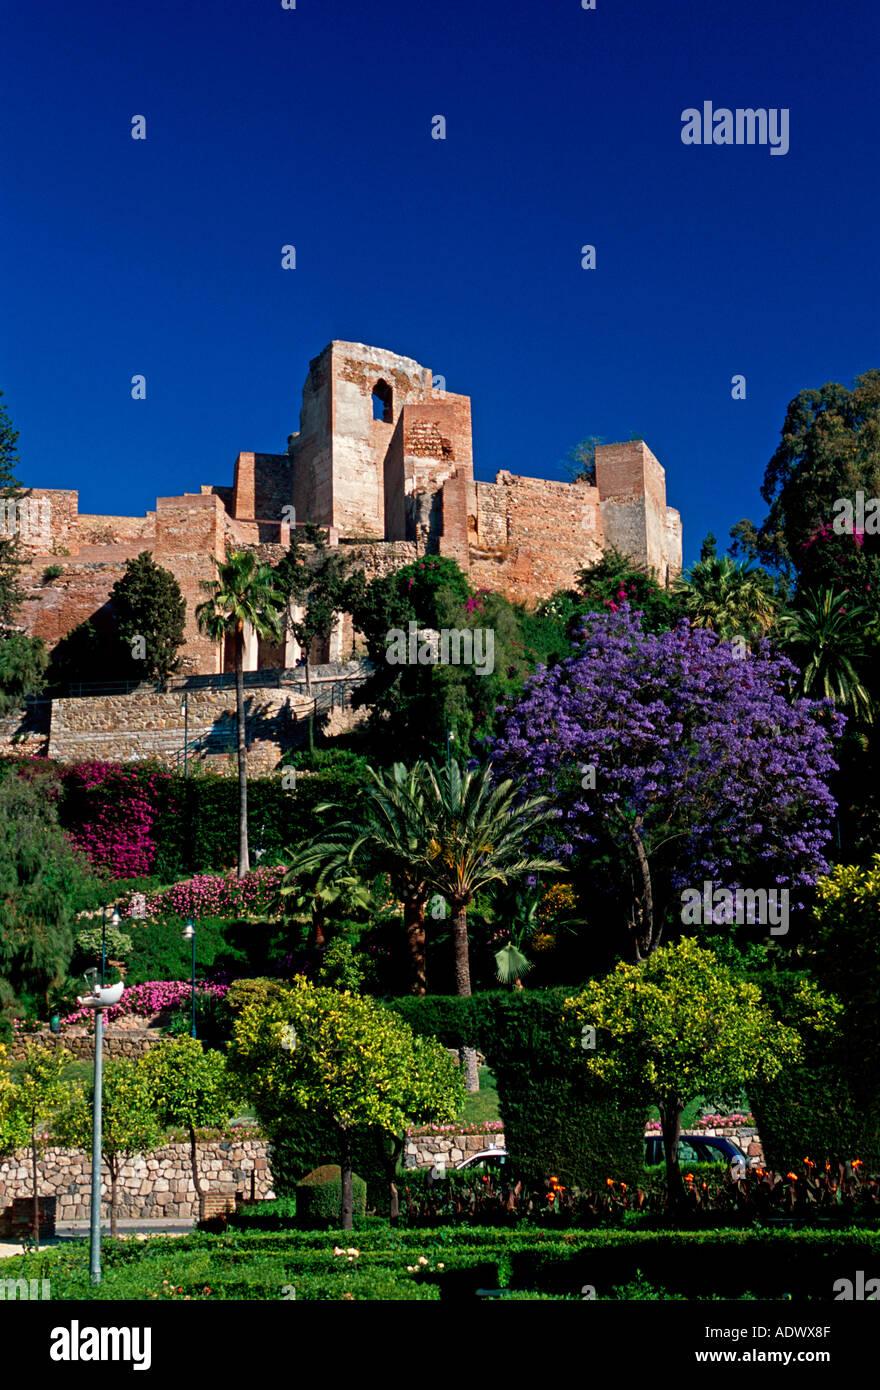 Alcazaba Kings Palace Moorish architecture Malaga Malaga Province Stock Photo...